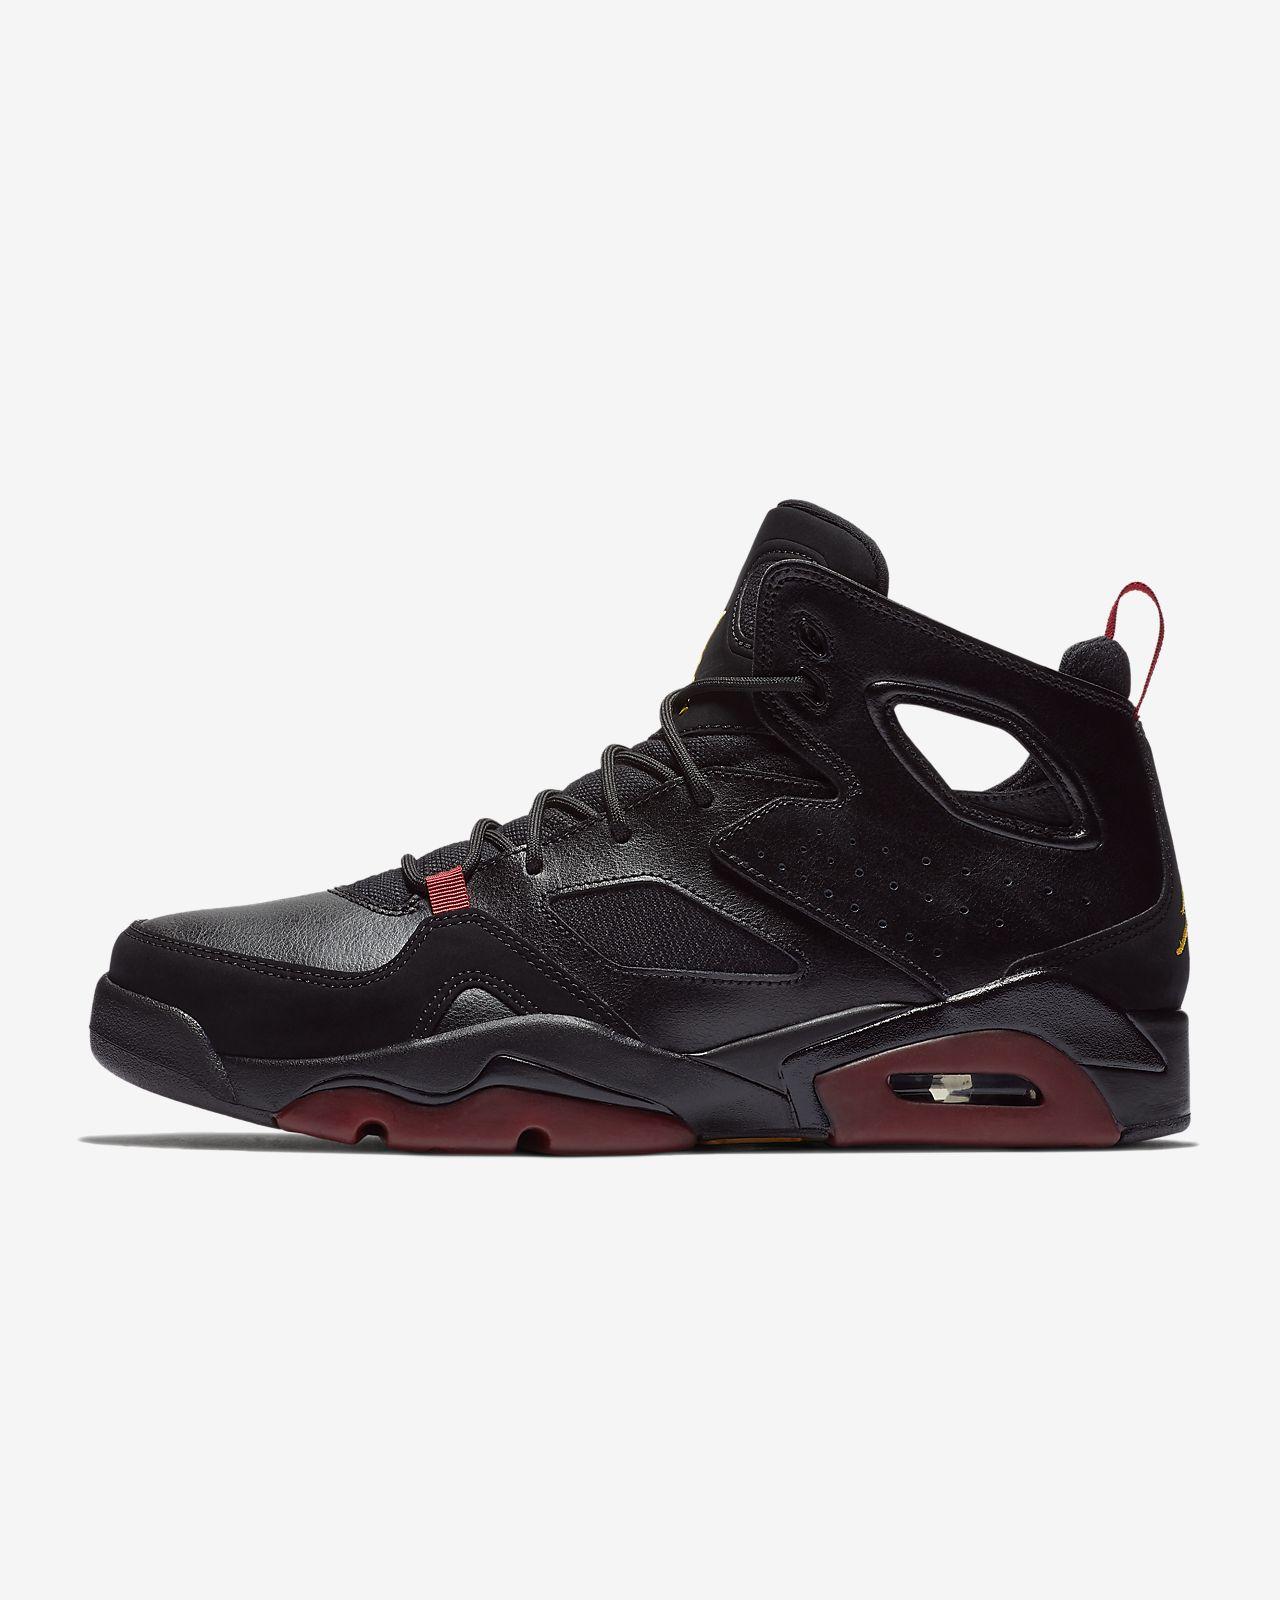 shiny jordans shoes